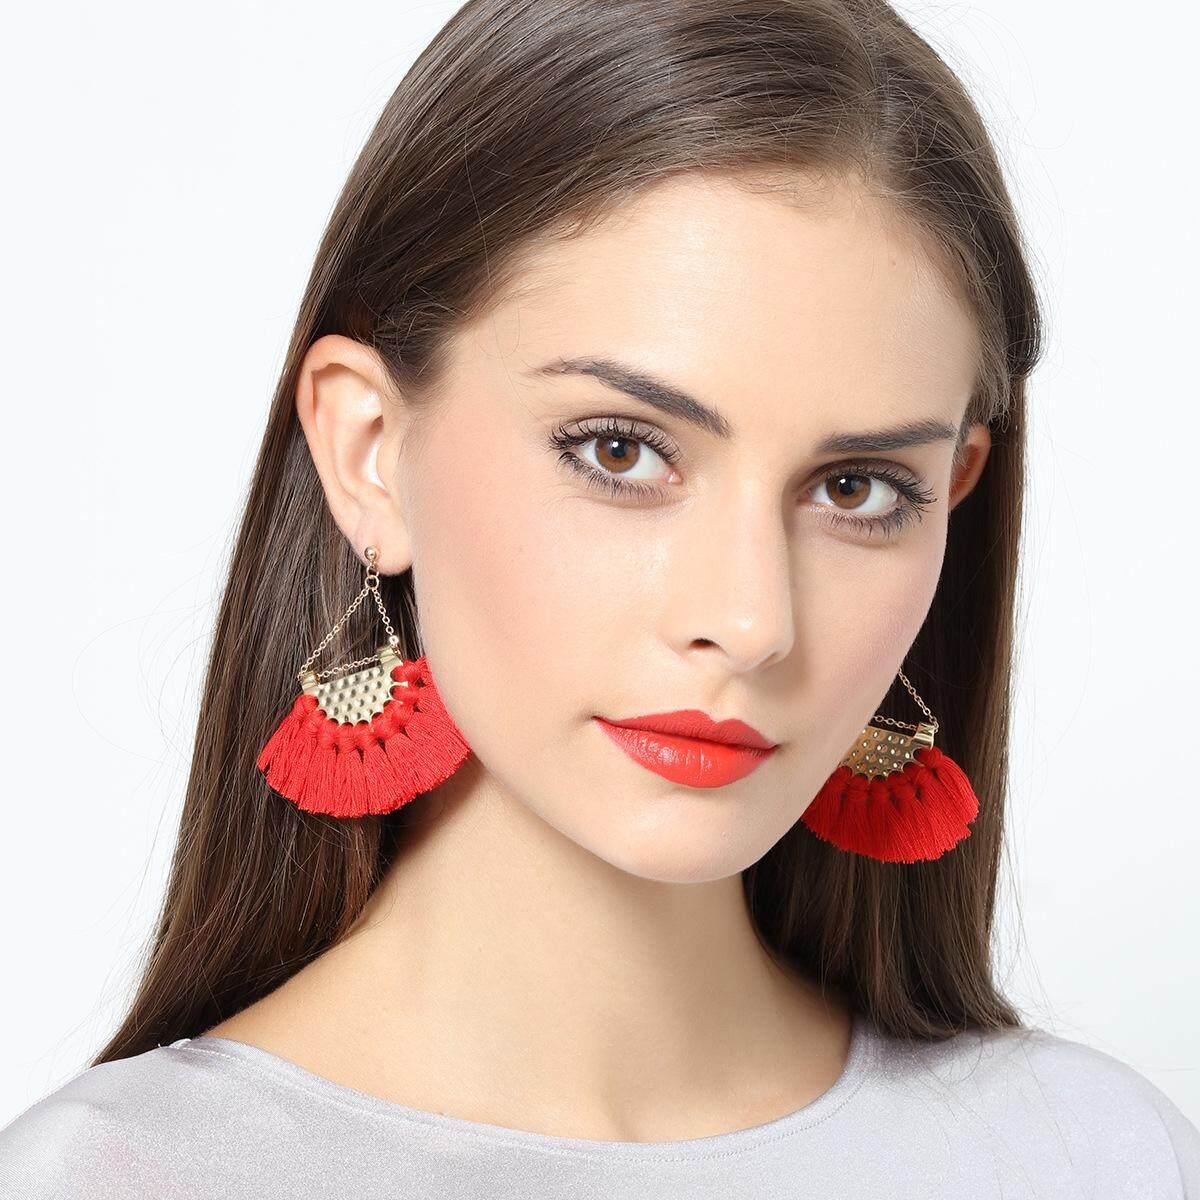 Wanita Bohemia Tassels Dangle Anting-Anting Berongga Penggemar Berbentuk Jatuh Ethnic Perhiasan 2018 Musim Semi Musim Panas Musim Gugur Musim Dingin Pesta Pakar Perempuan Anting -Internasional